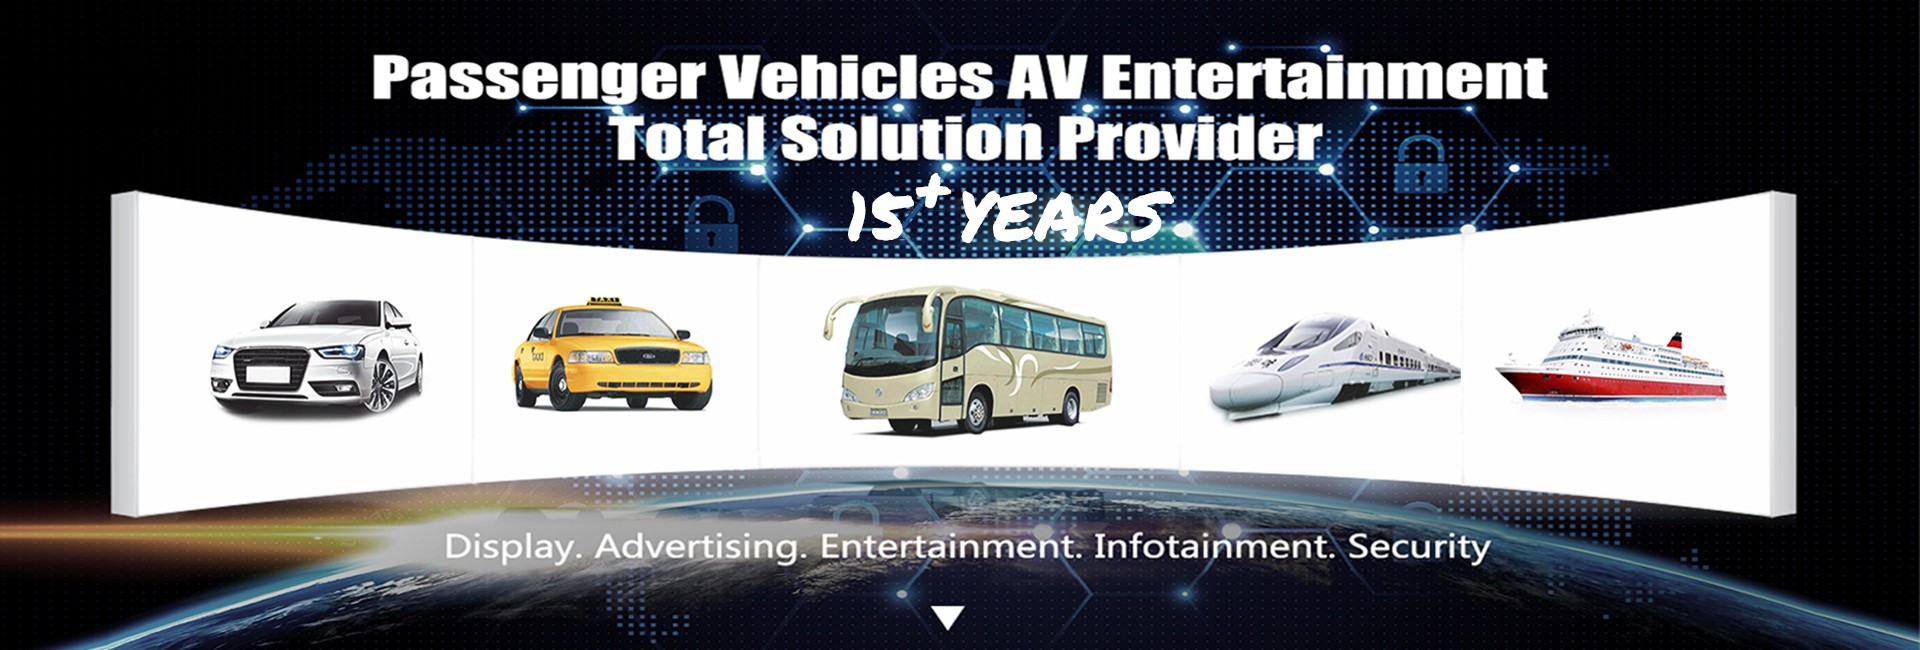 Total Solution Provider